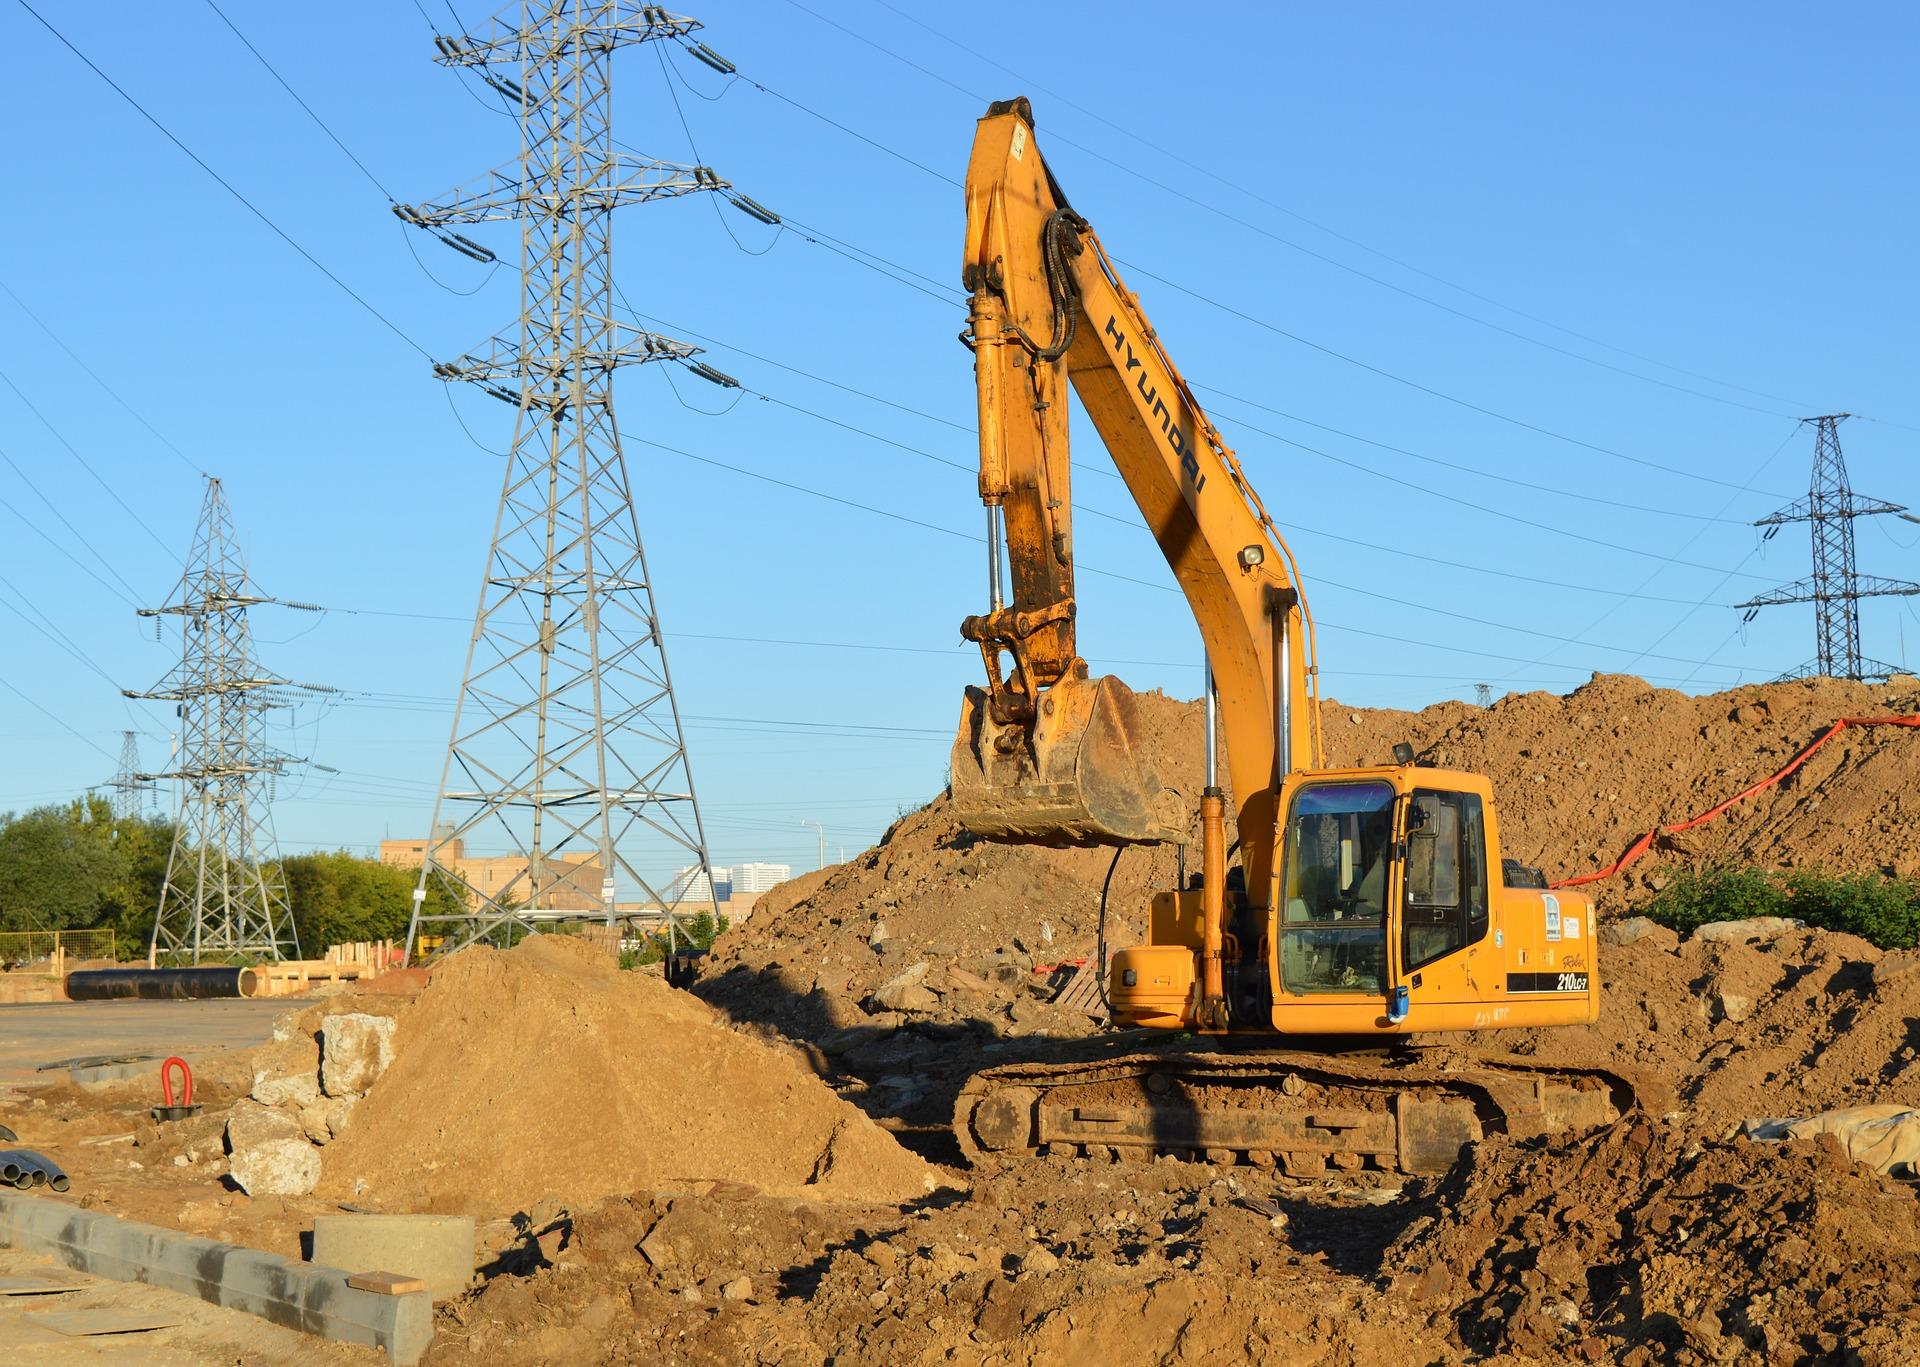 excavator-1640399_1920.jpg